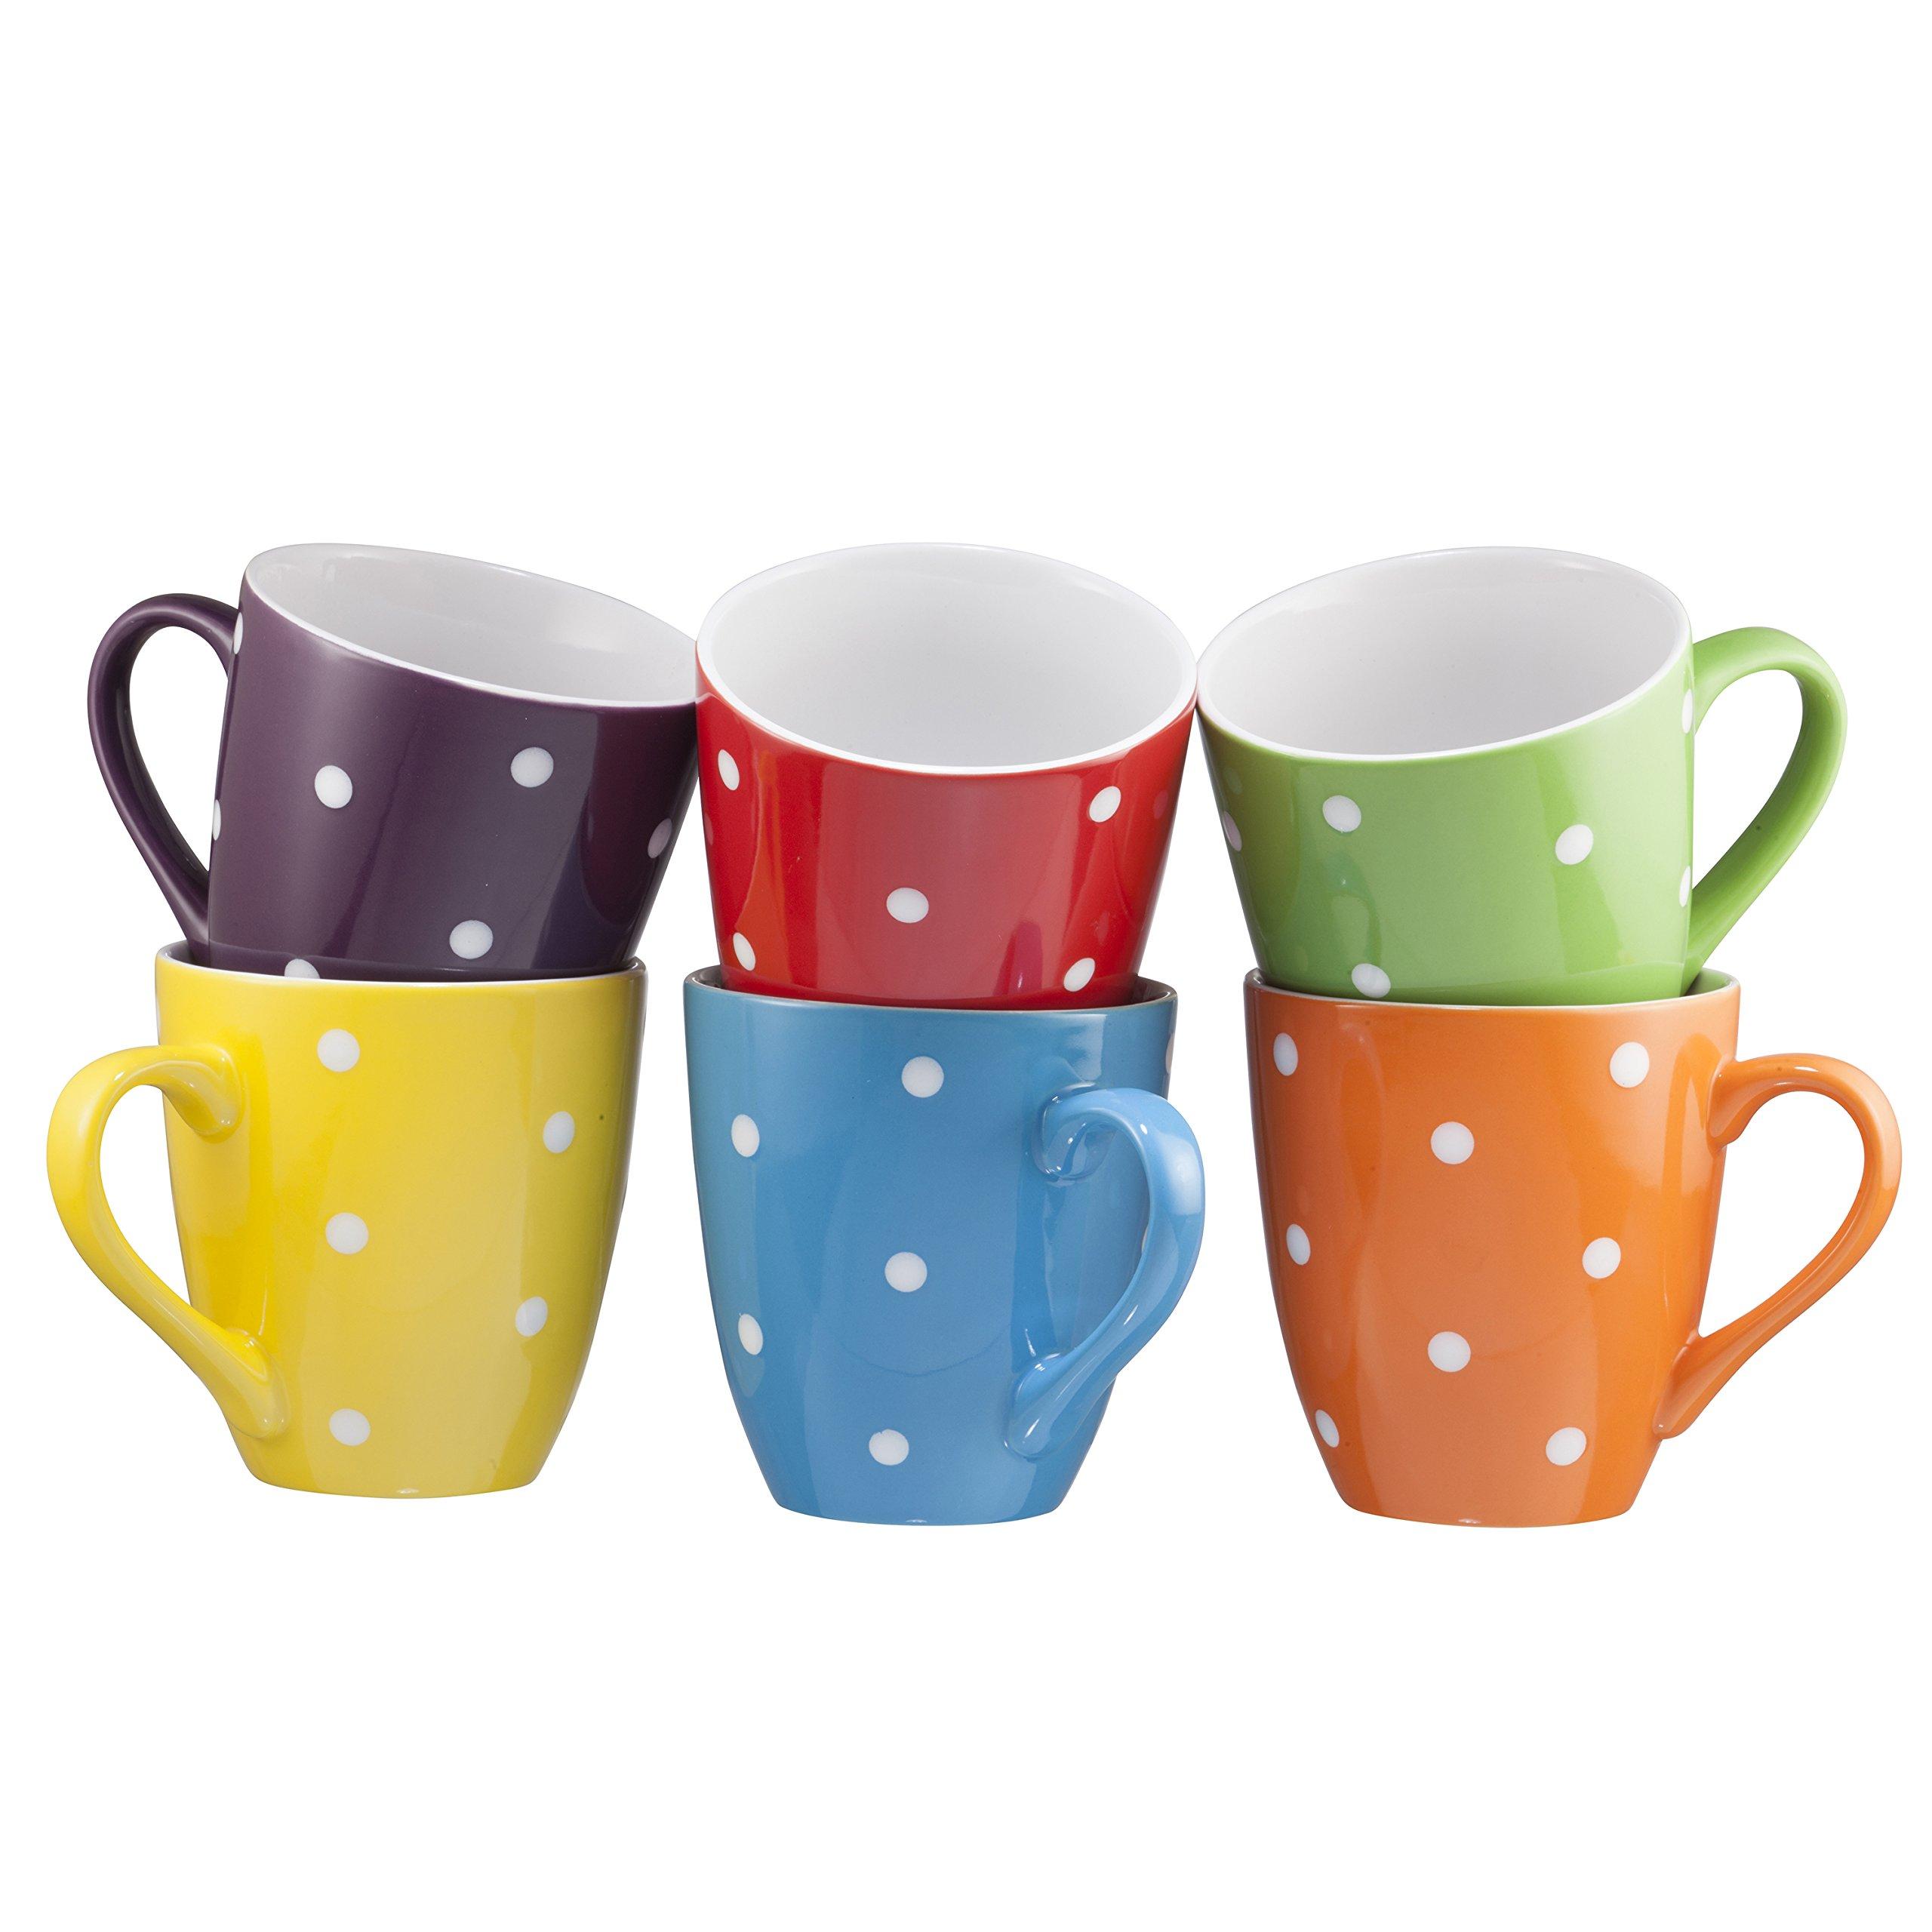 Coffee Mug Set Set of 6 Large-sized 16 Ounce Ceramic Coffee Mugs Restaurant Coffee Mugs By Bruntmor (Polka Dot) by Bruntmor (Image #2)